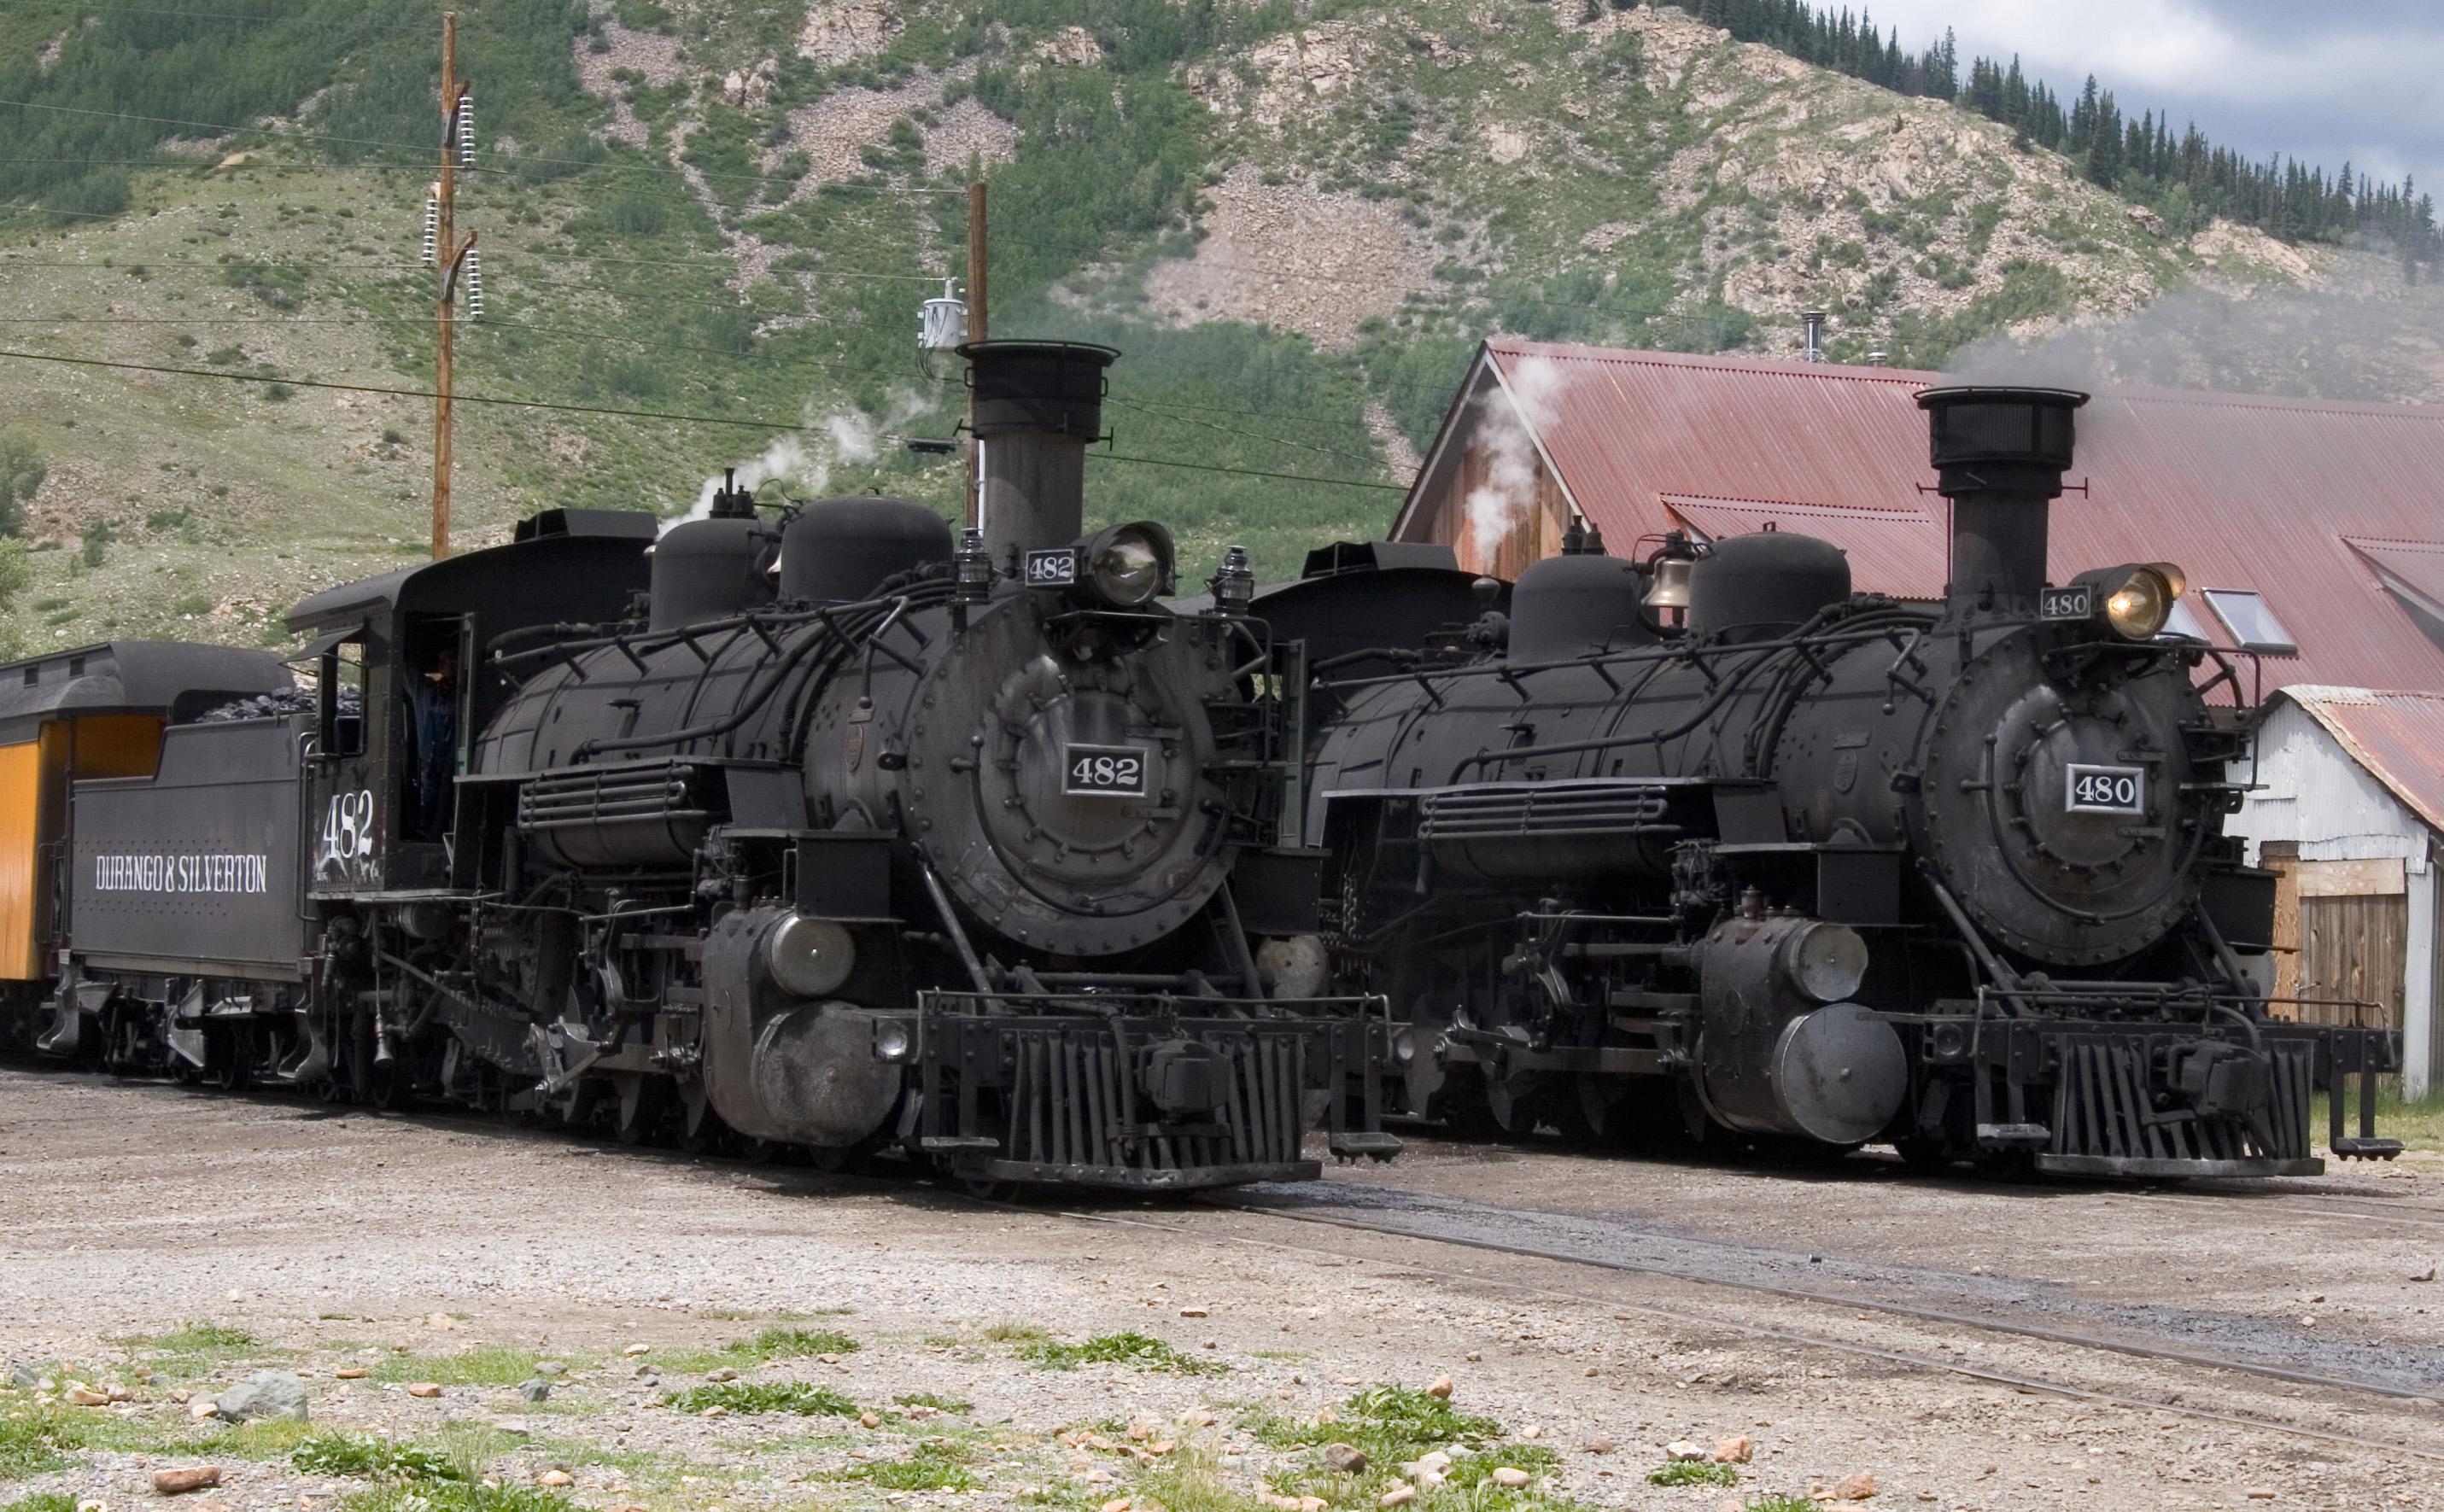 Durango And Silverton Narrow Gauge Railroad Wikiwand